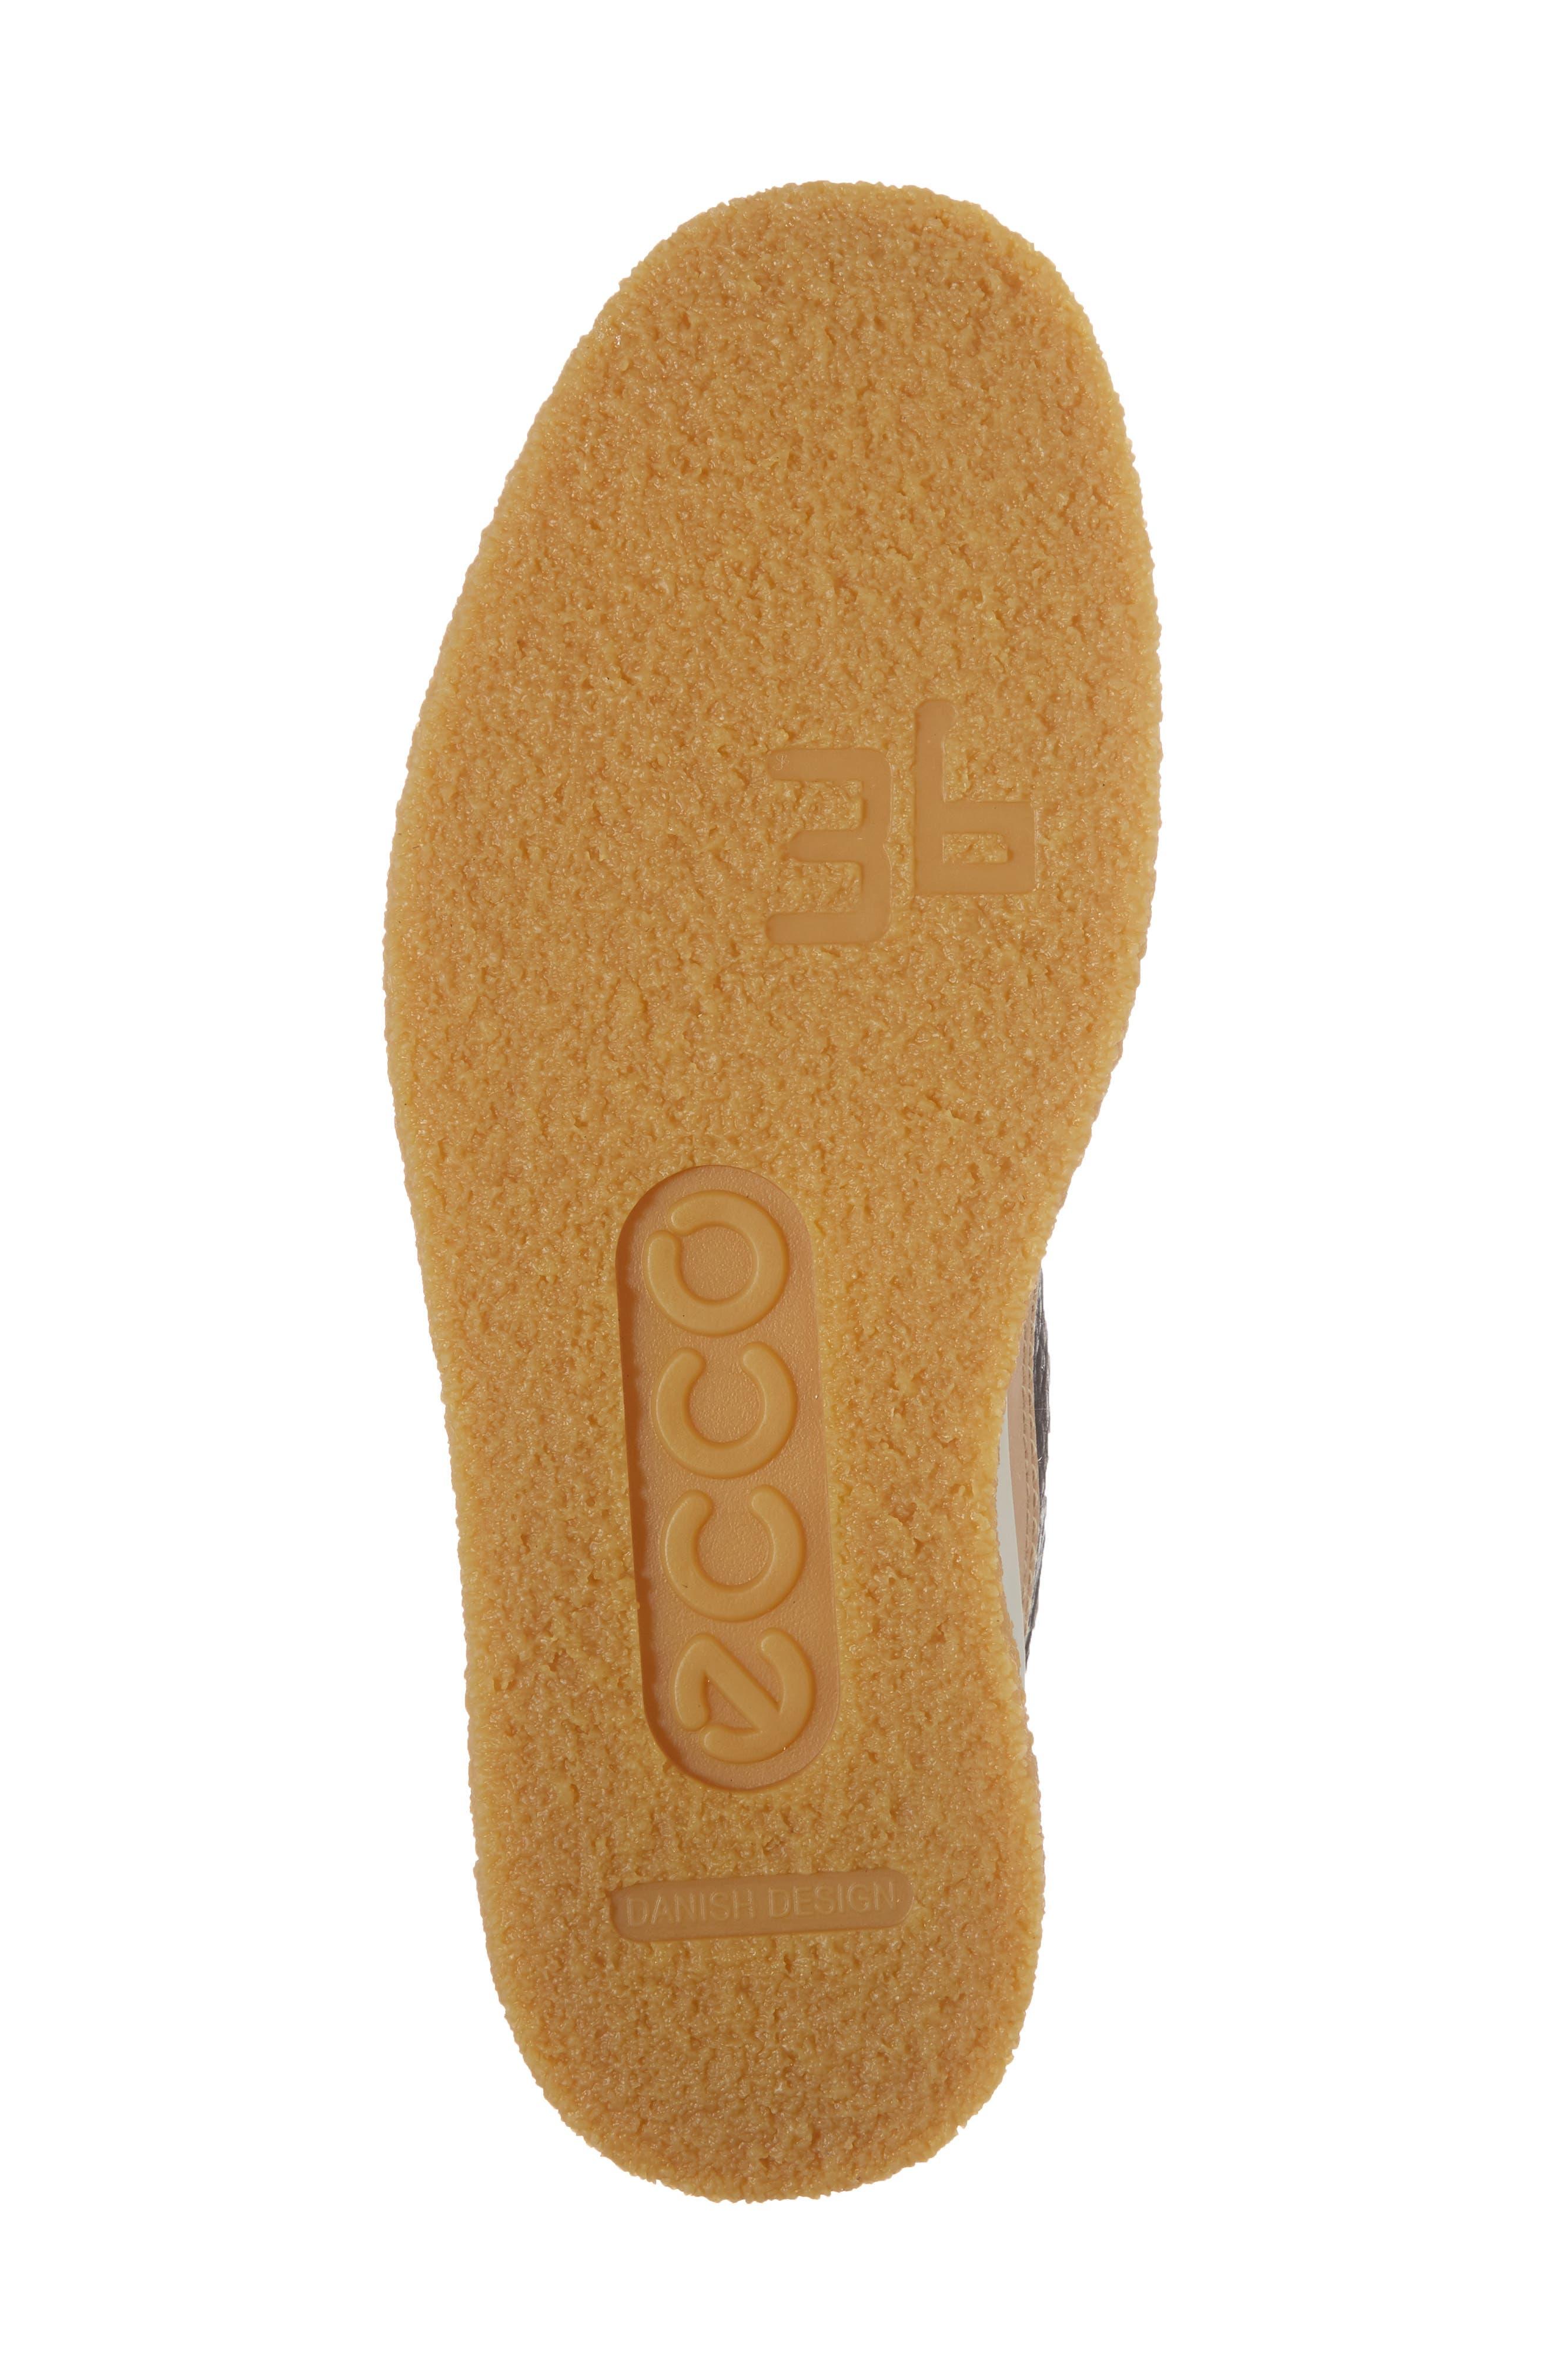 Crepetray Chukka Boot,                             Alternate thumbnail 6, color,                             Black Powder Leather